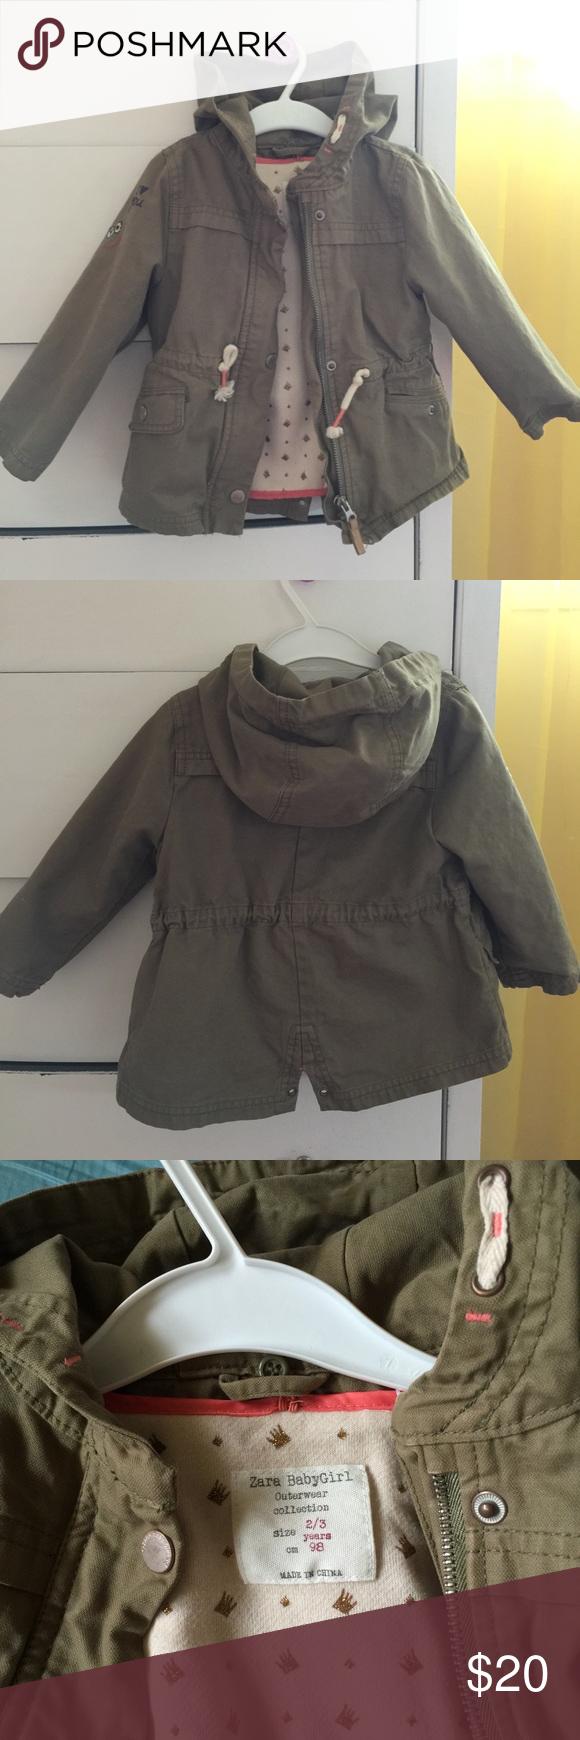 1b06174bd Zara baby girl coat Zara baby girl coat 2/3 years Zara Jackets ...